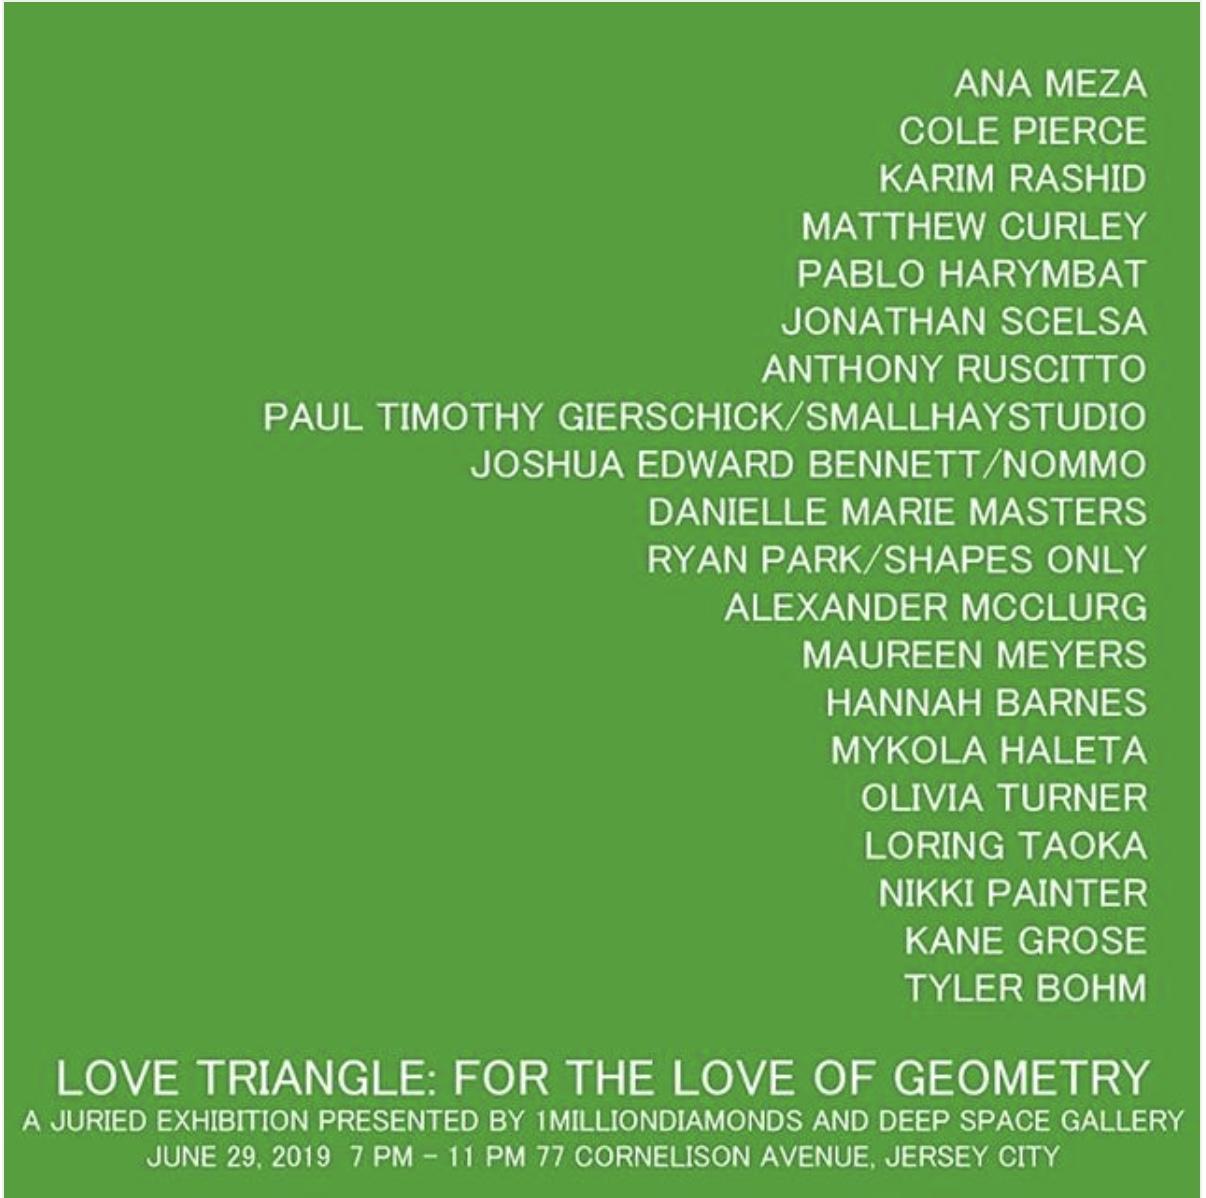 love triangle announcement.jpeg